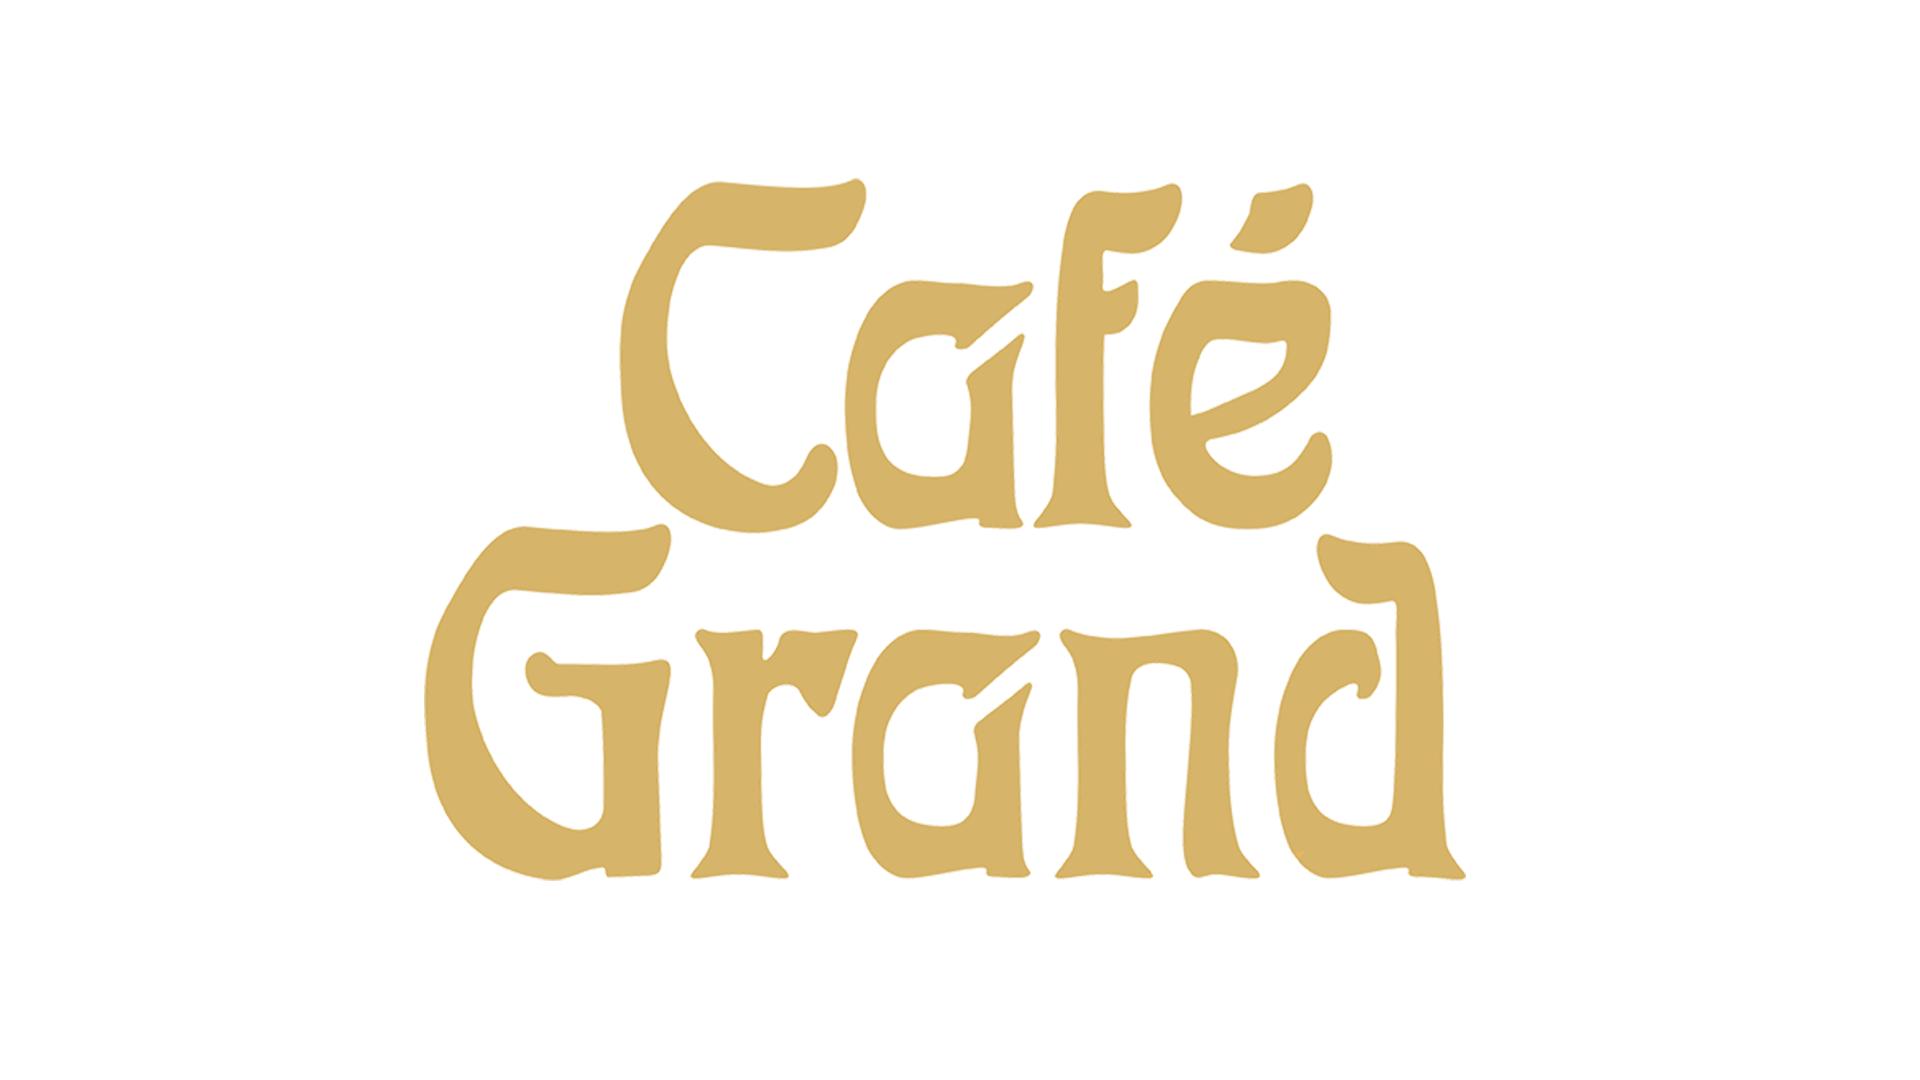 Mullfest Cafe' Grand Pärnu mullitab suvefestival 2019